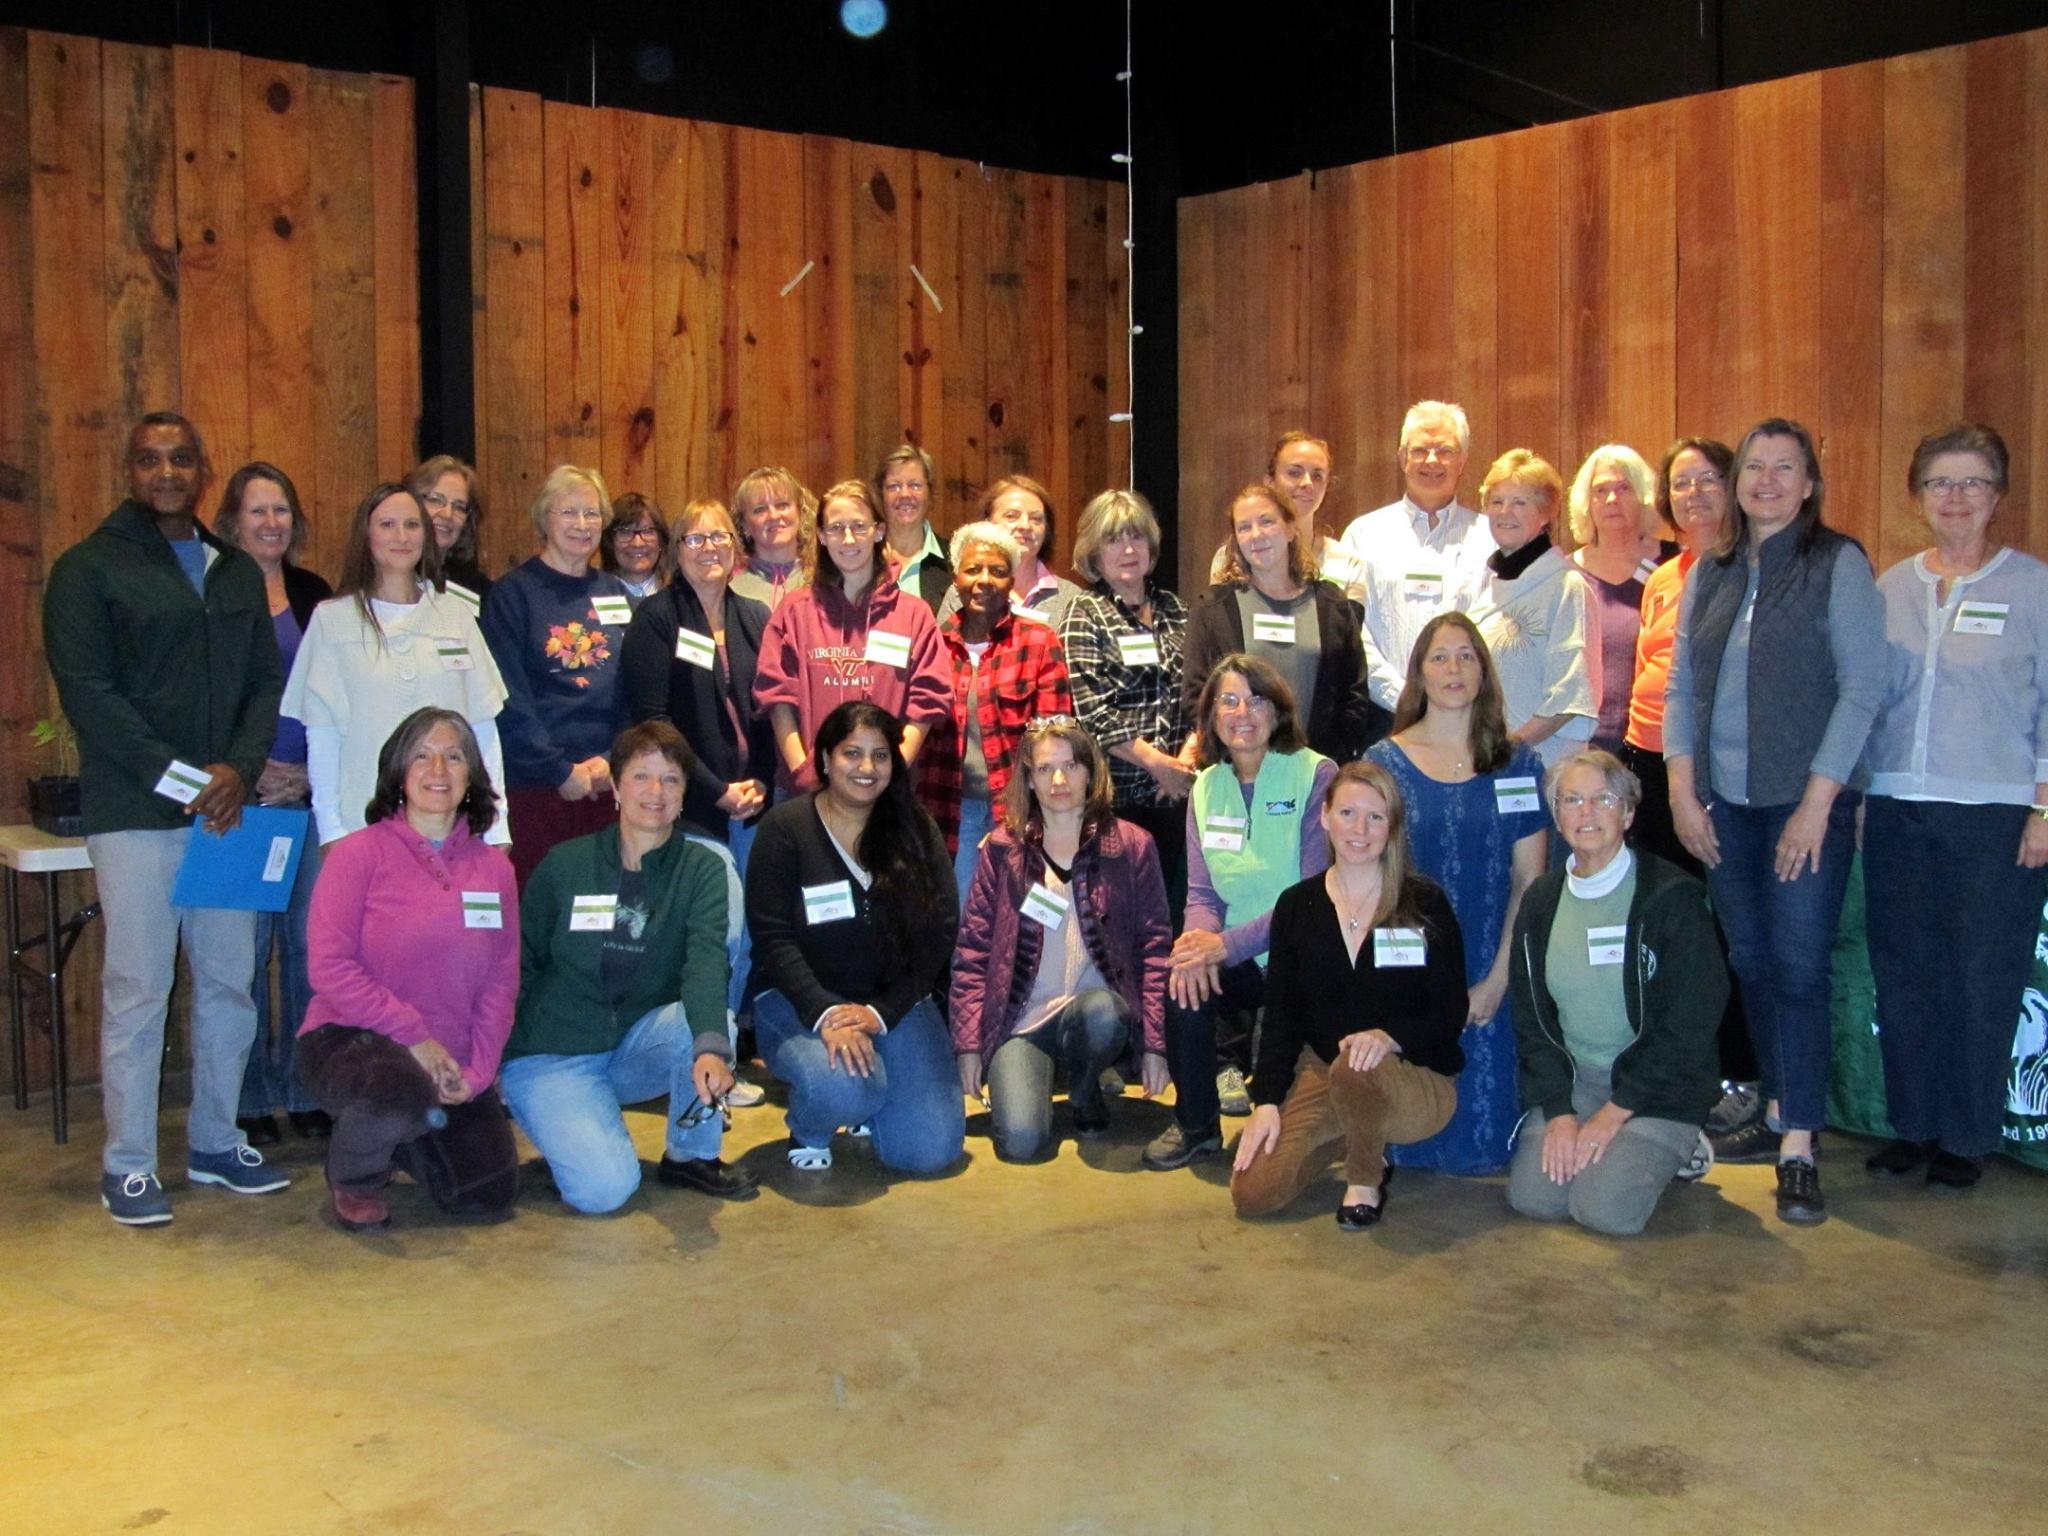 Oct 2015 volunteer training at Morven Park in Loudoun County